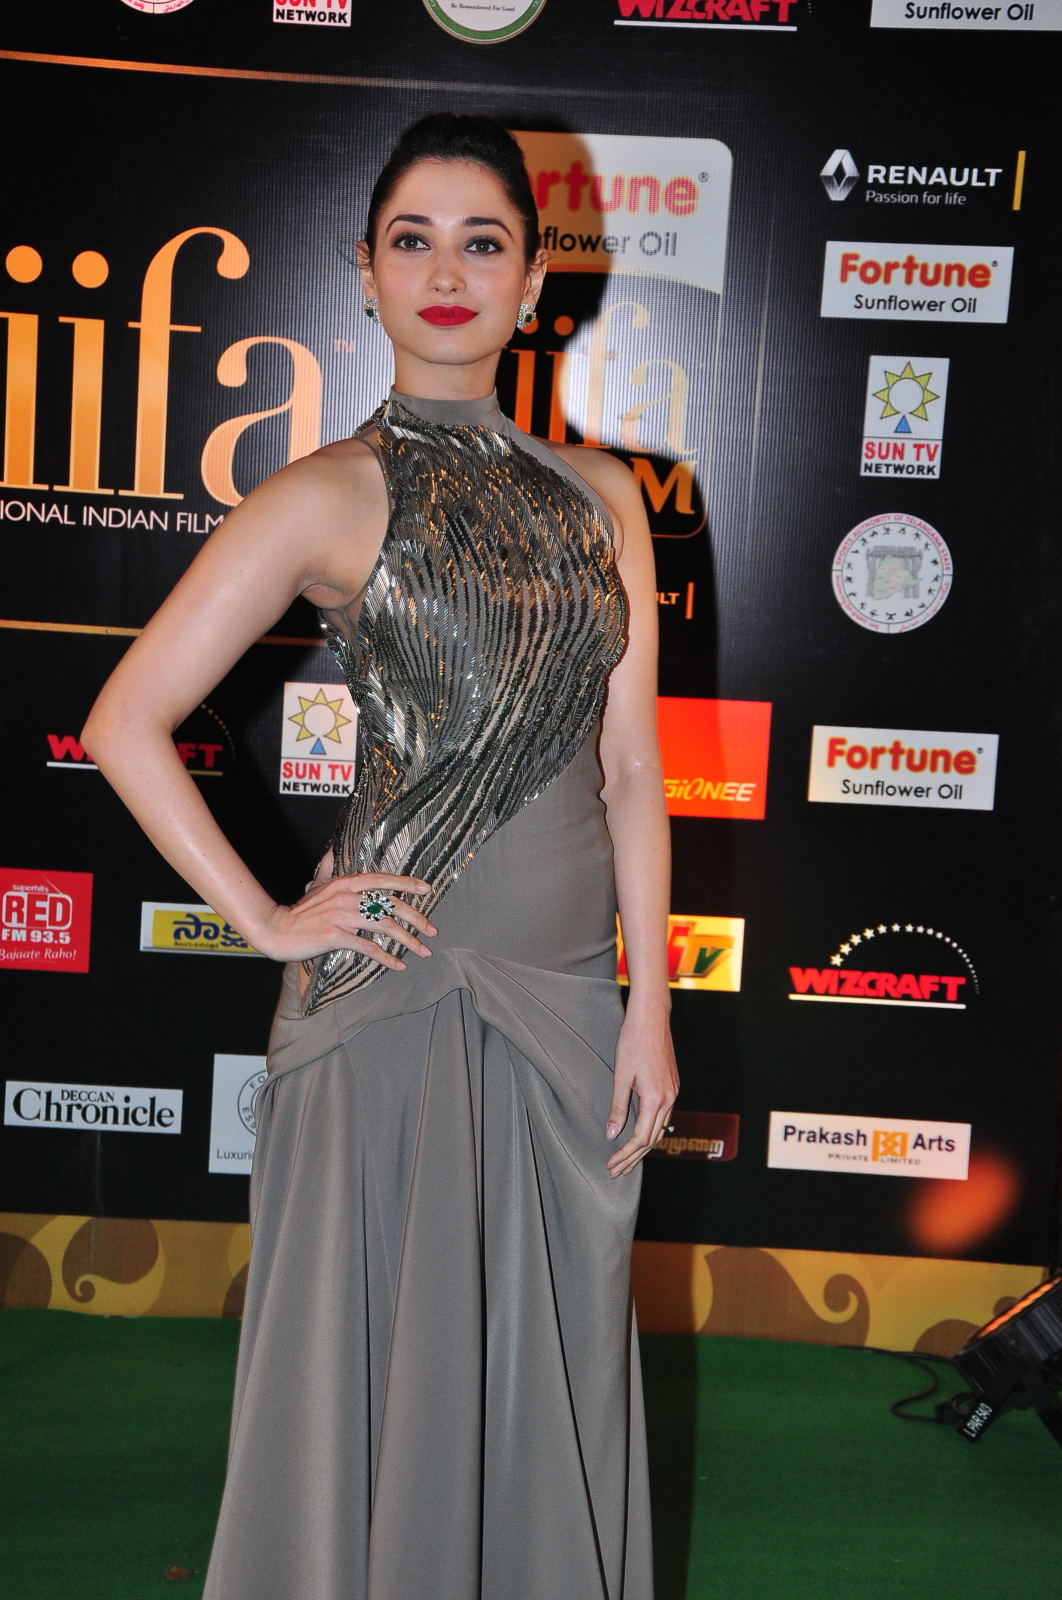 IIFA Awards Main Event 2018 Hindi 400MB HDRip 480p x264 Download